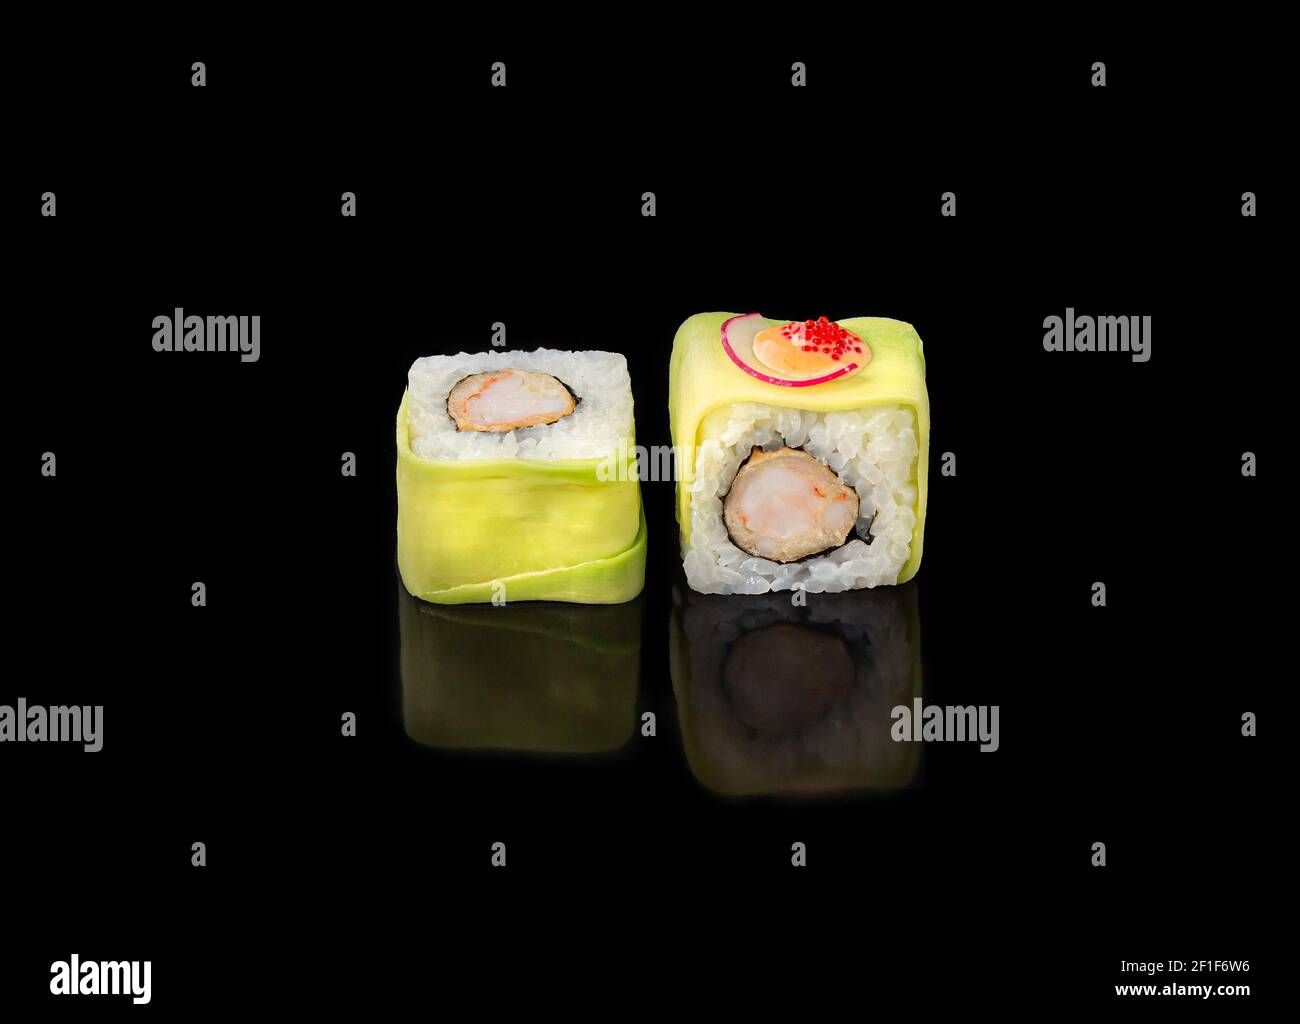 sushi rolls on a black background, japanese cuisine. Stock Photo